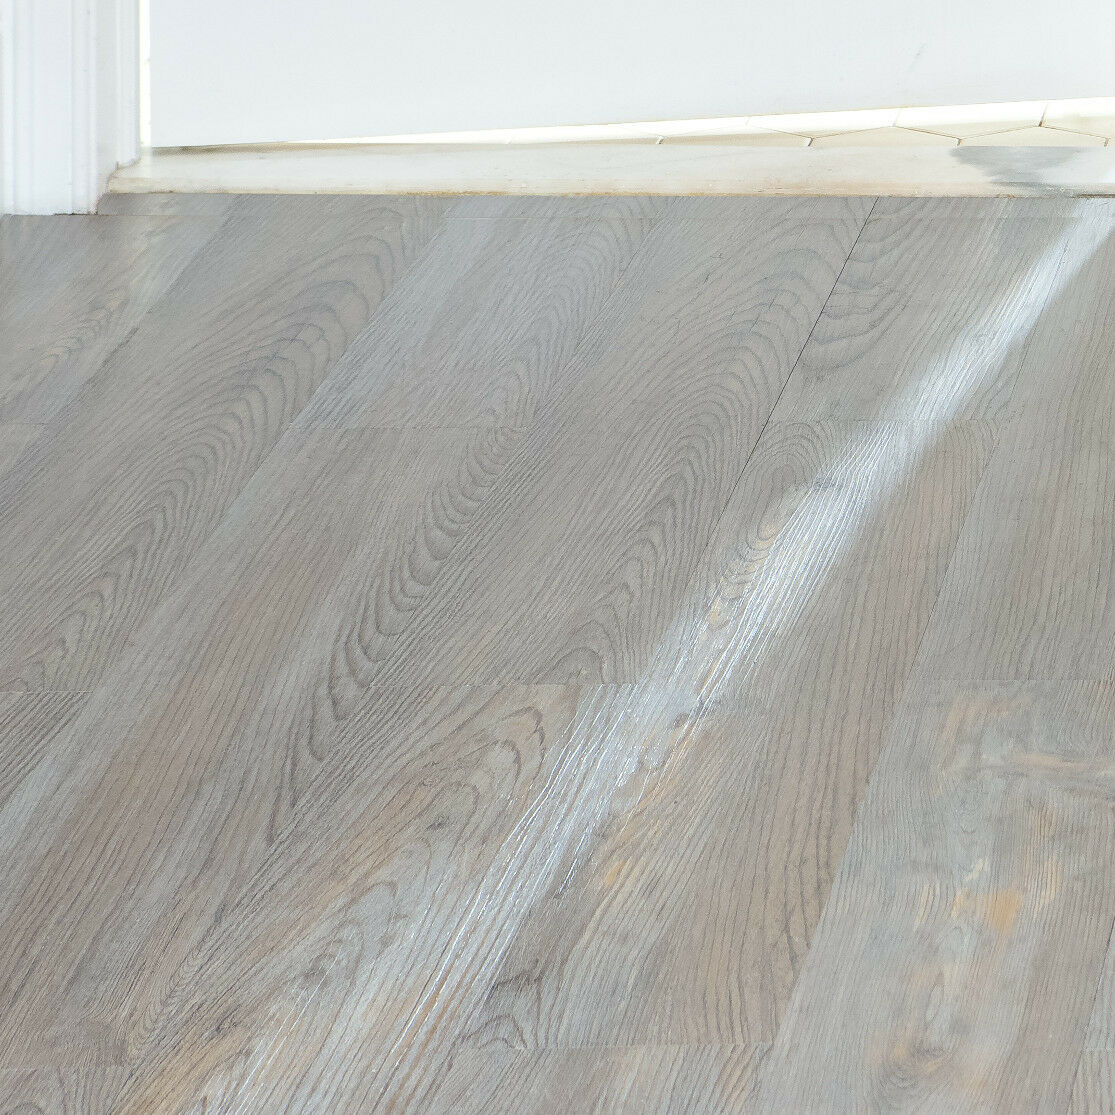 Vinyl plank flooring tile look images lvt flooring photo for Wood grain linoleum flooring